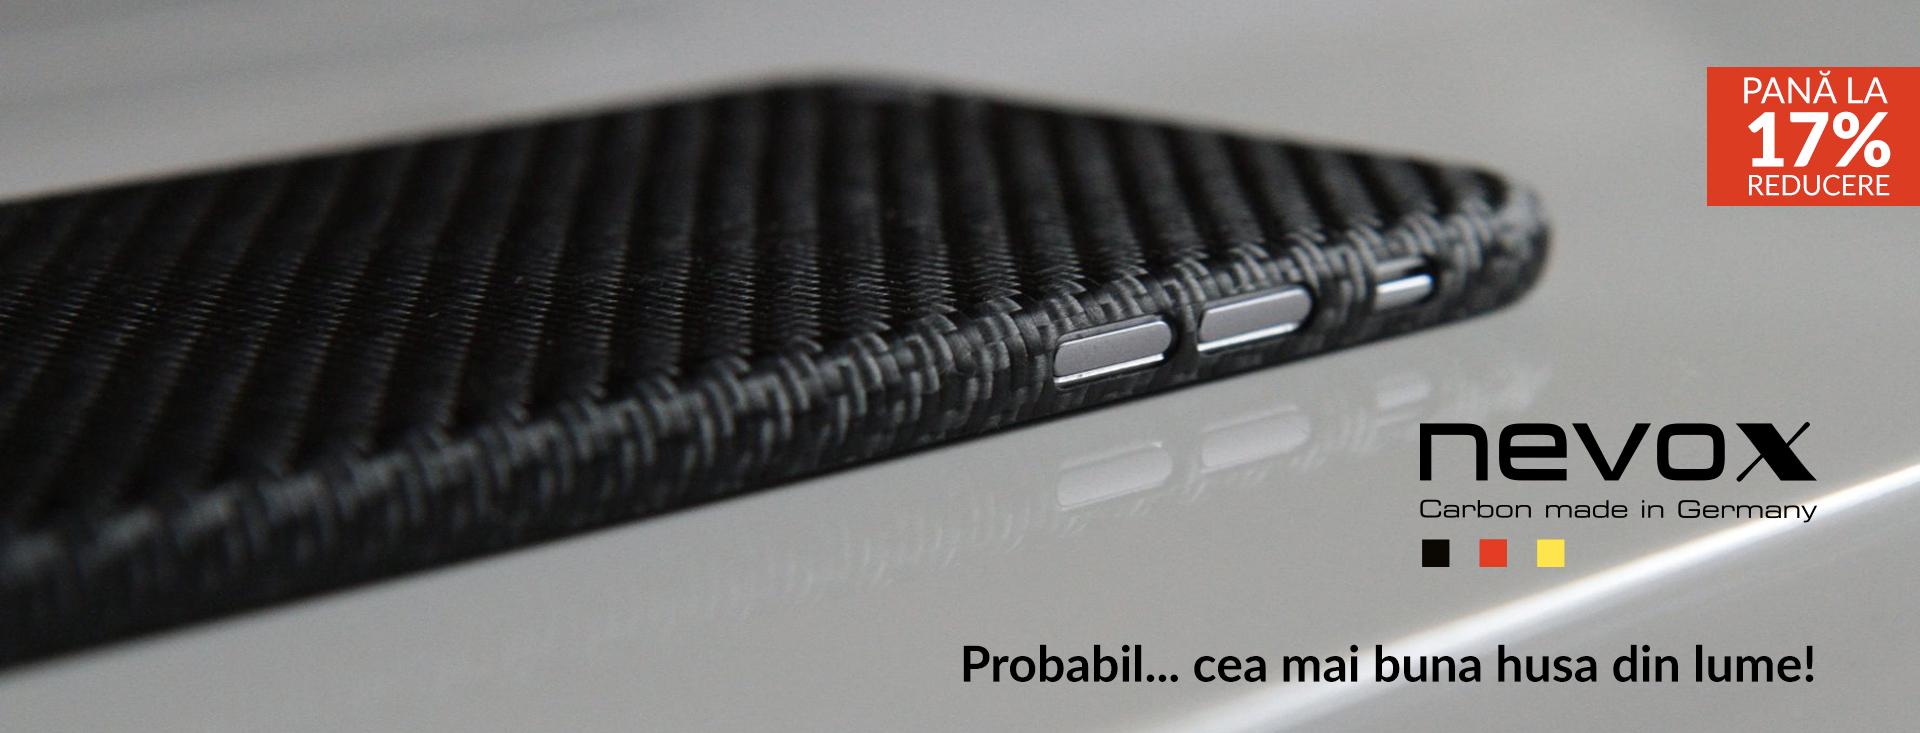 nevox-carbon